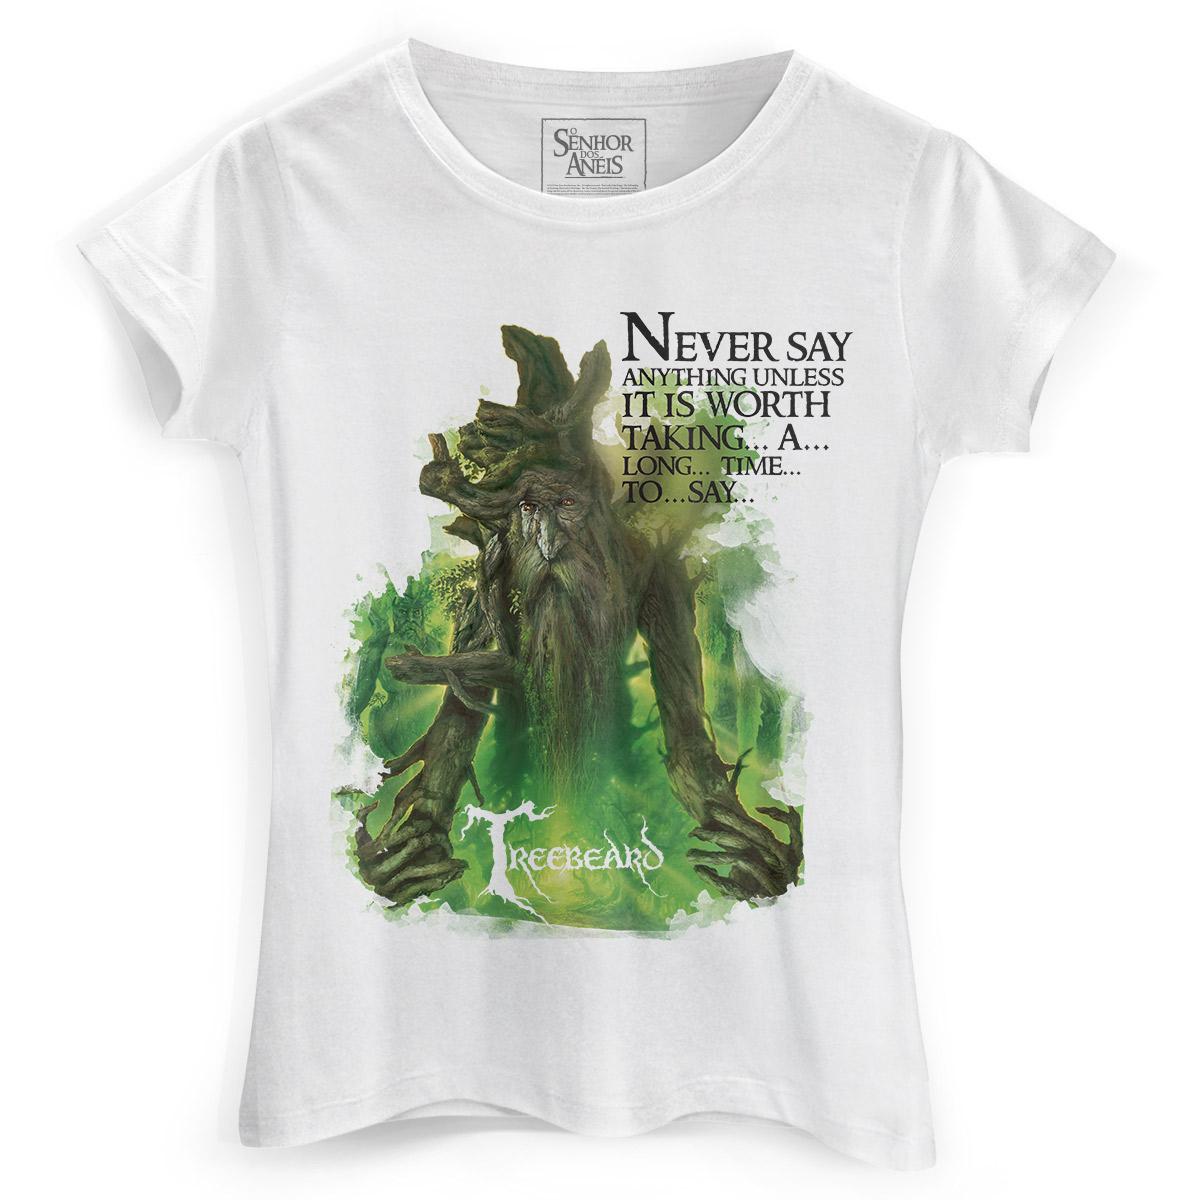 Camiseta Feminina O Senhor dos Anéis Treebeard